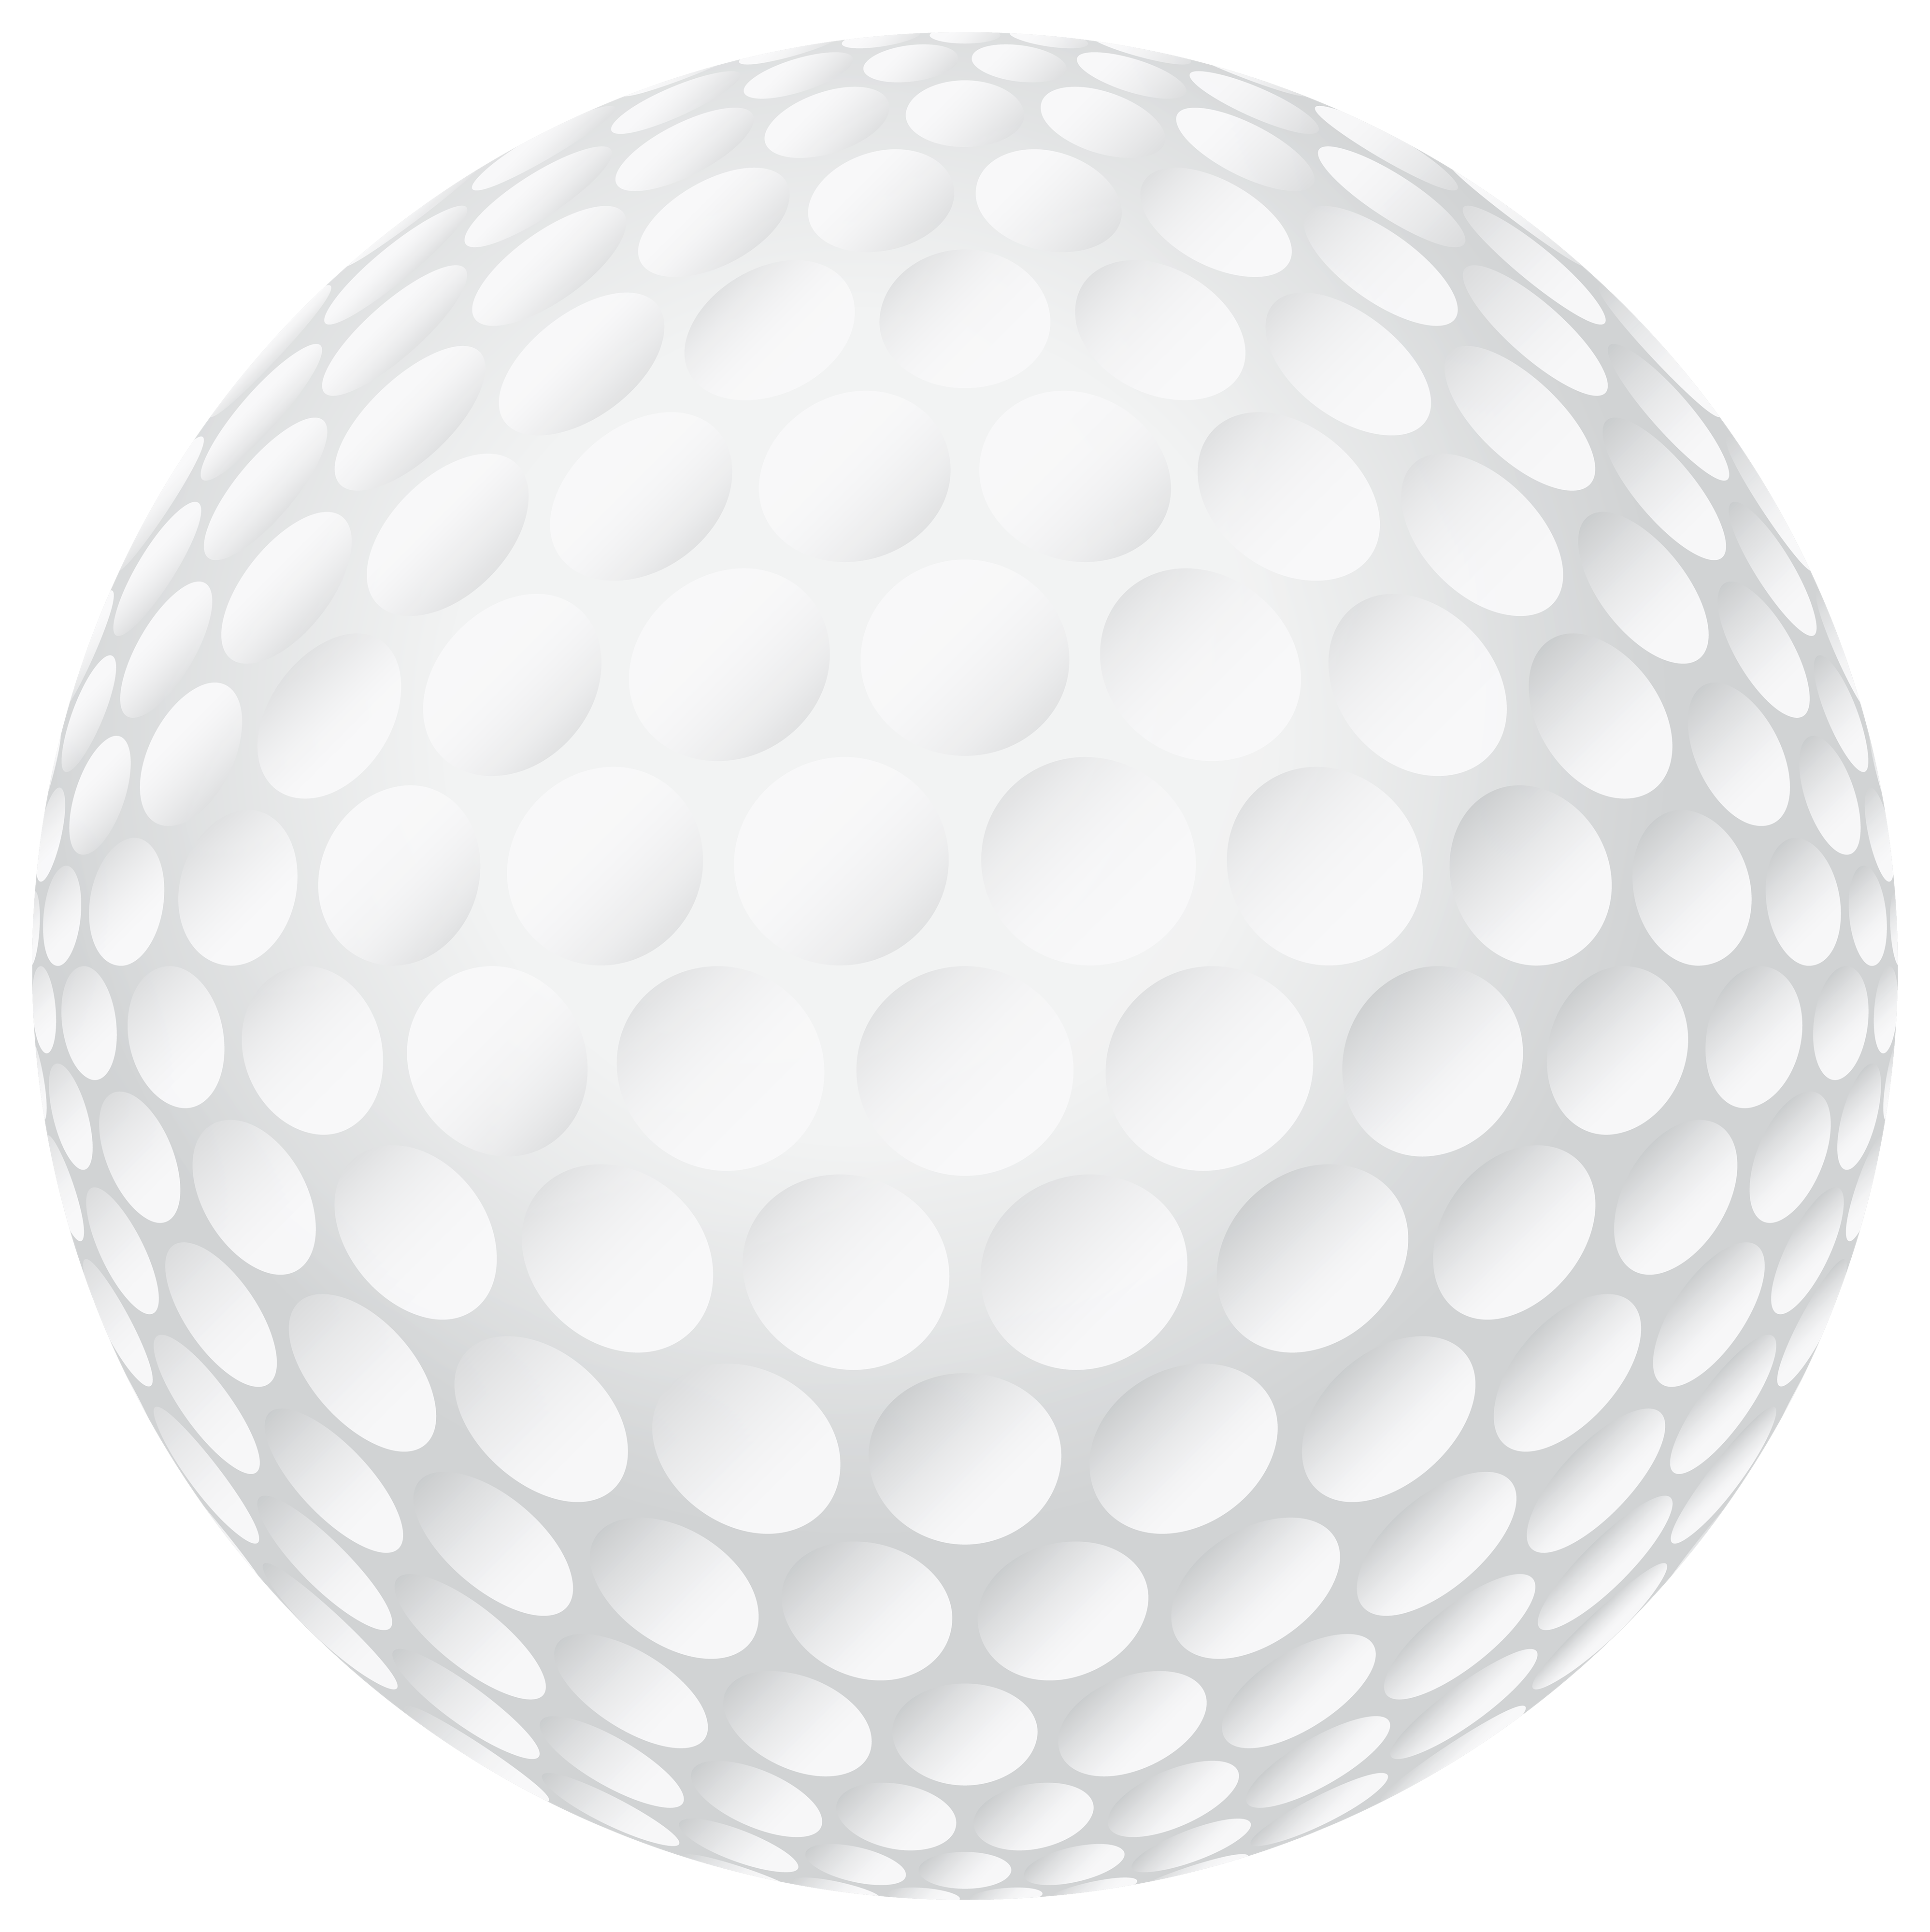 vector freeuse stock Golf clipart golf ball. Png best web